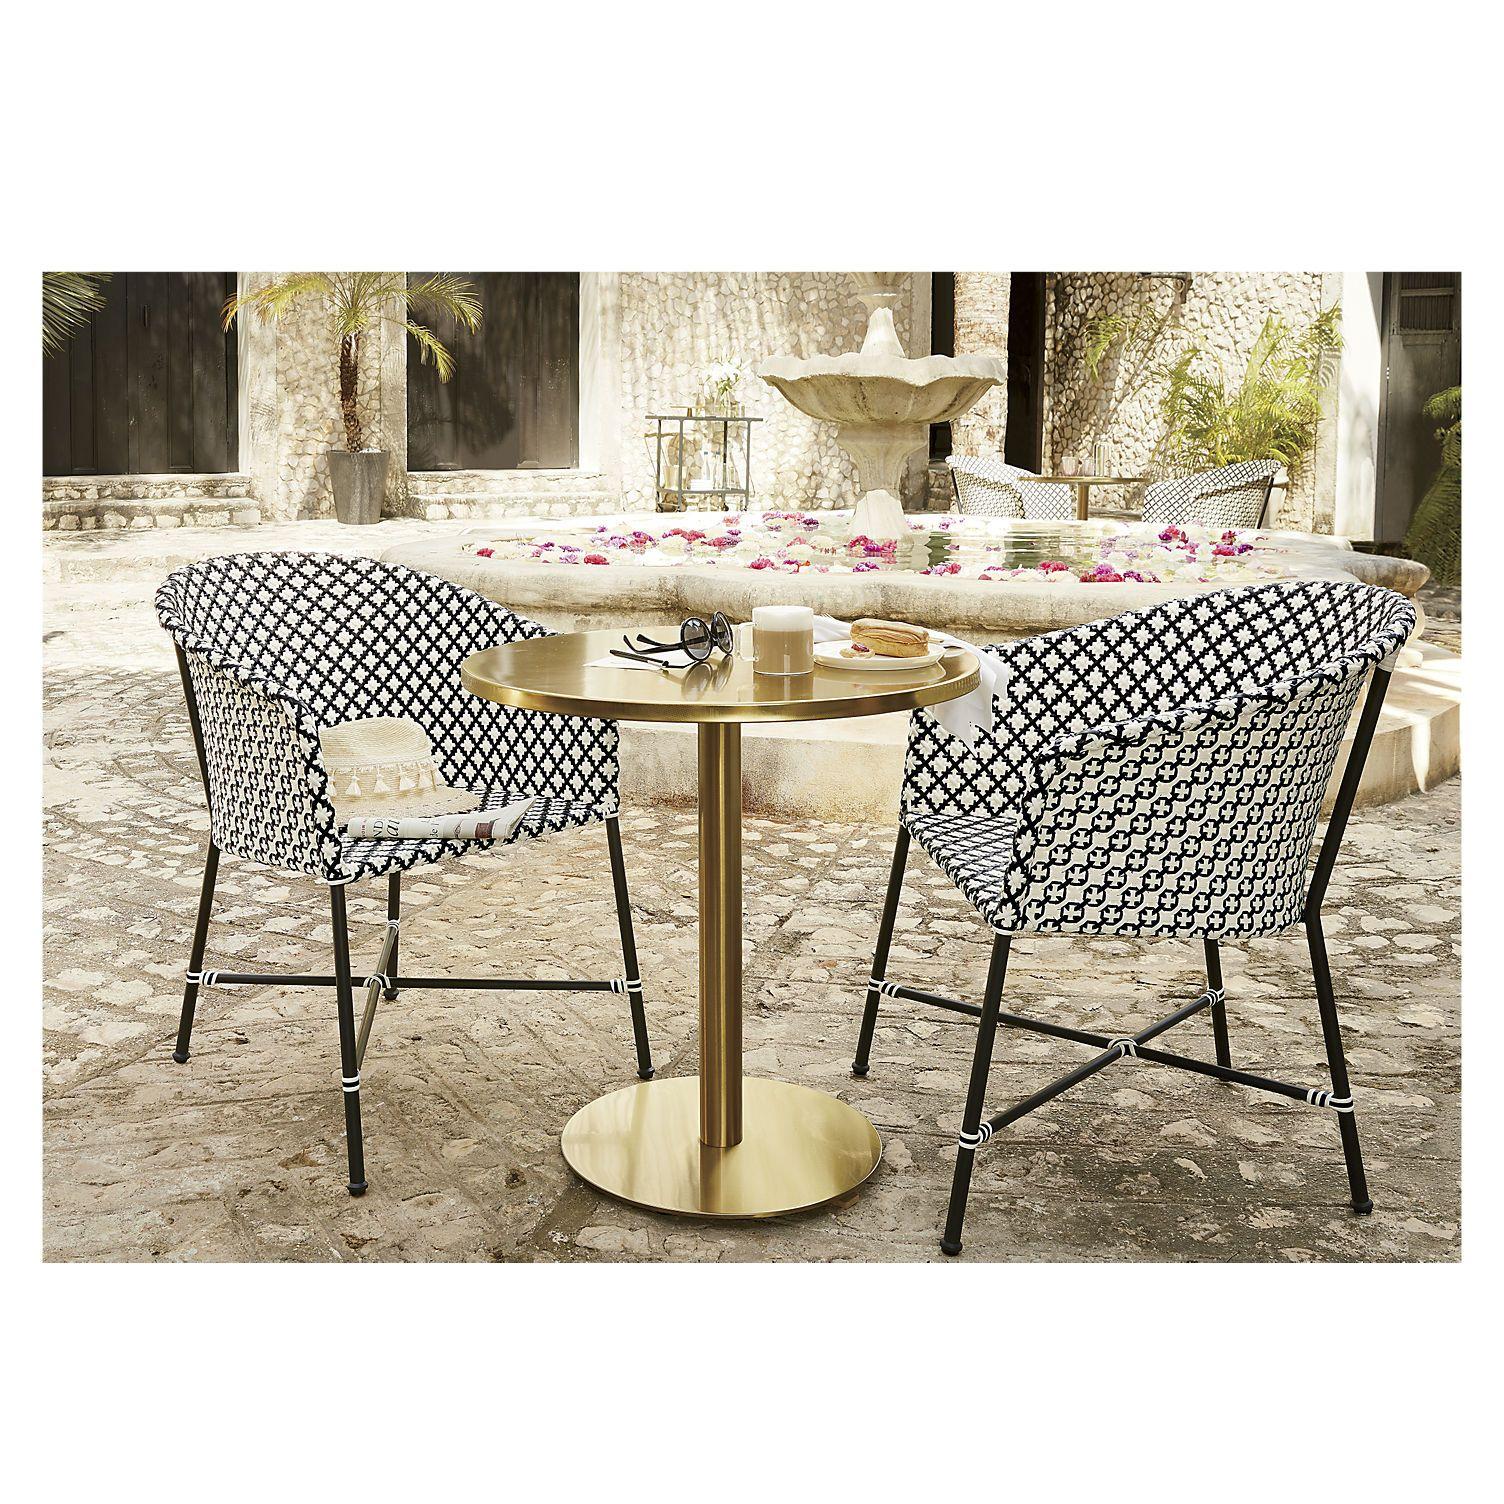 Brava outdoor wicker dining chair cb2